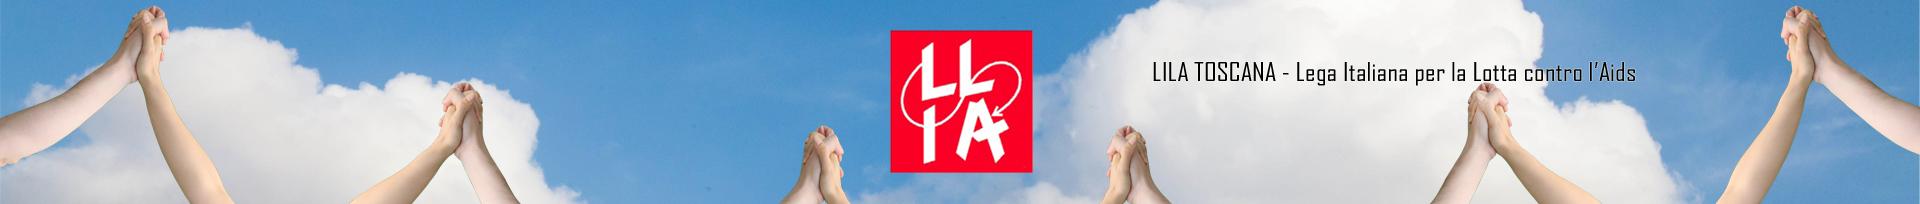 banner proposta Lila_web